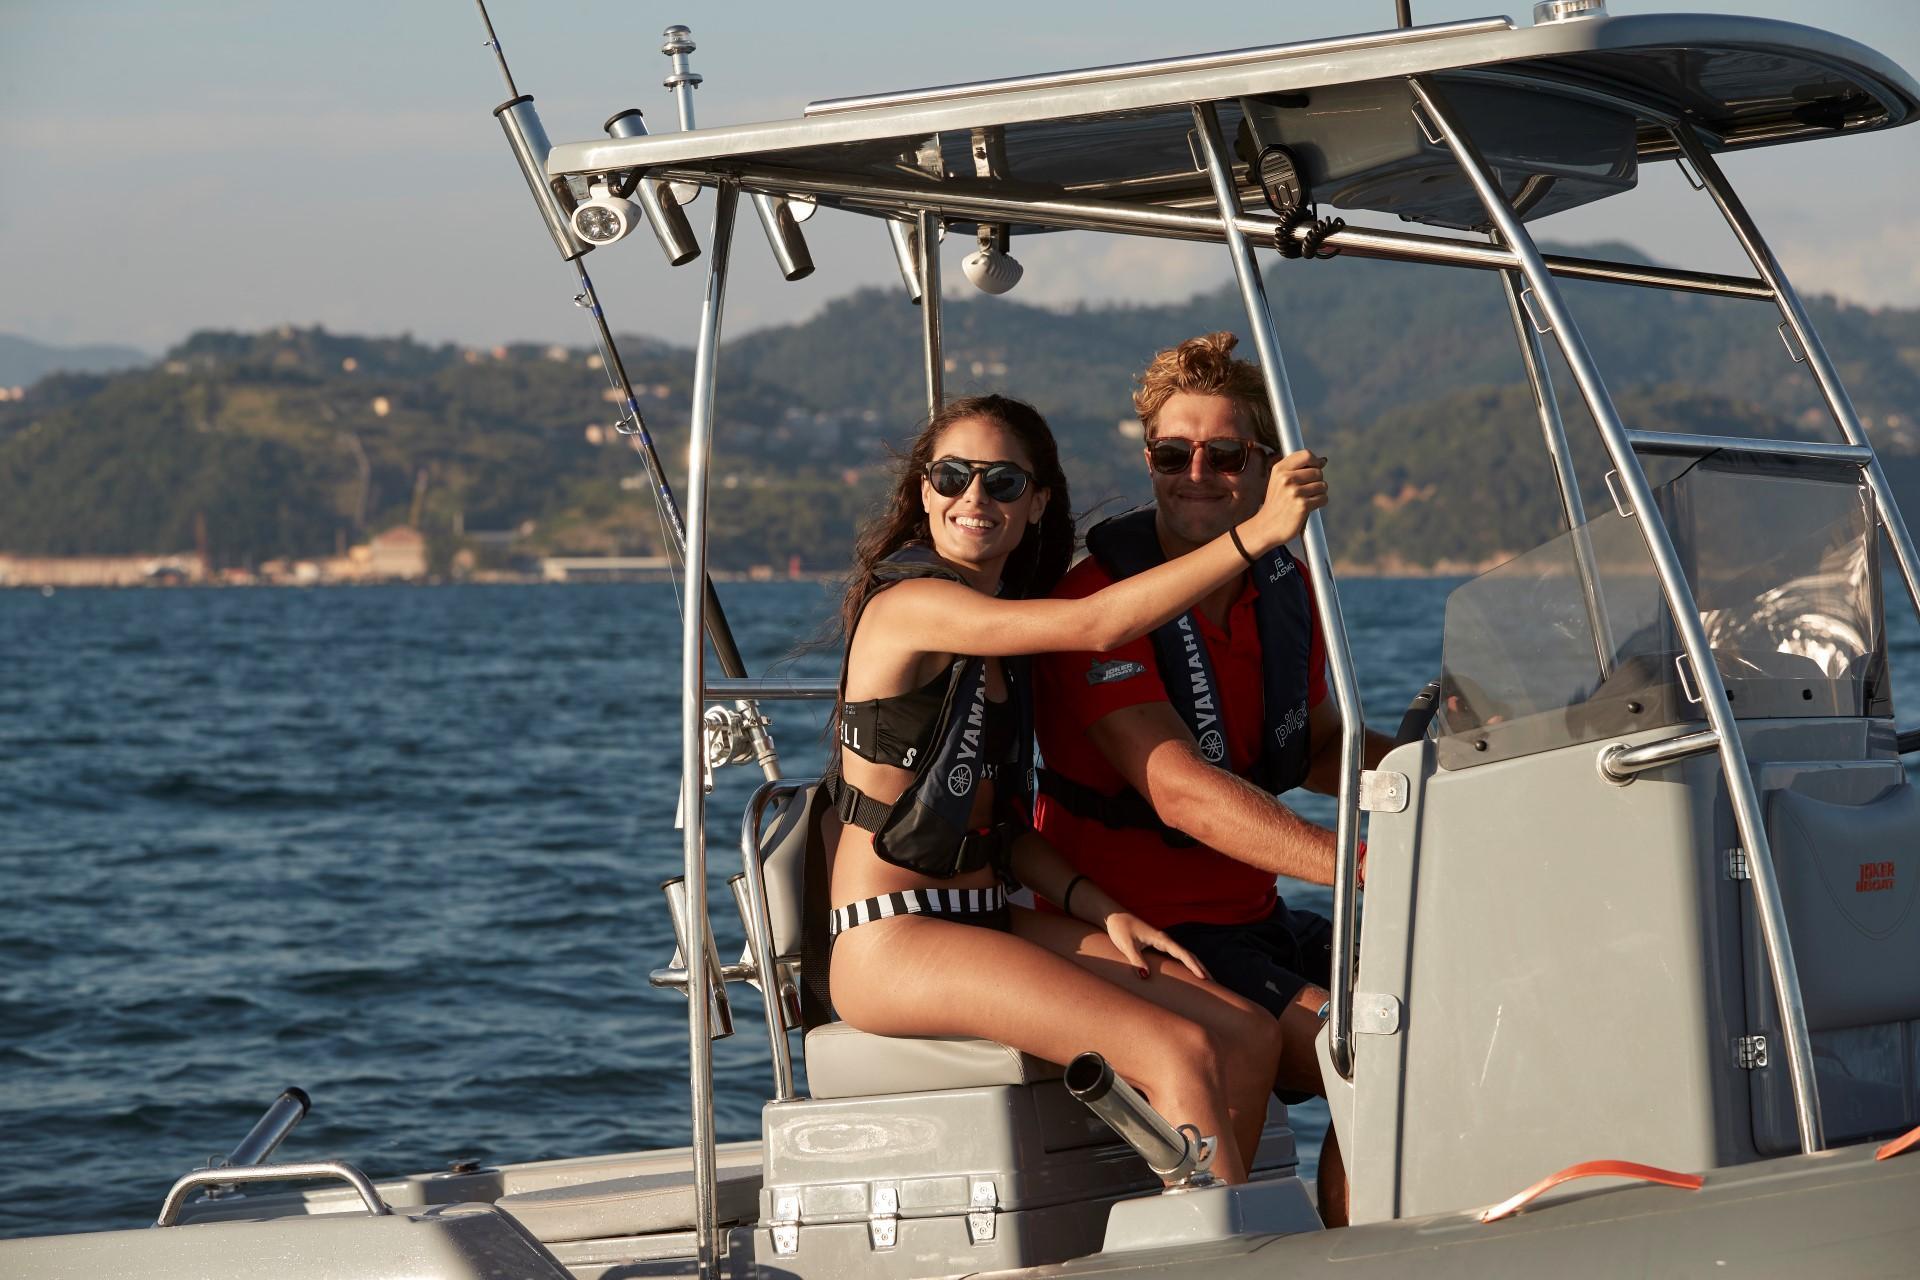 Joker Boat Barracuda fishing